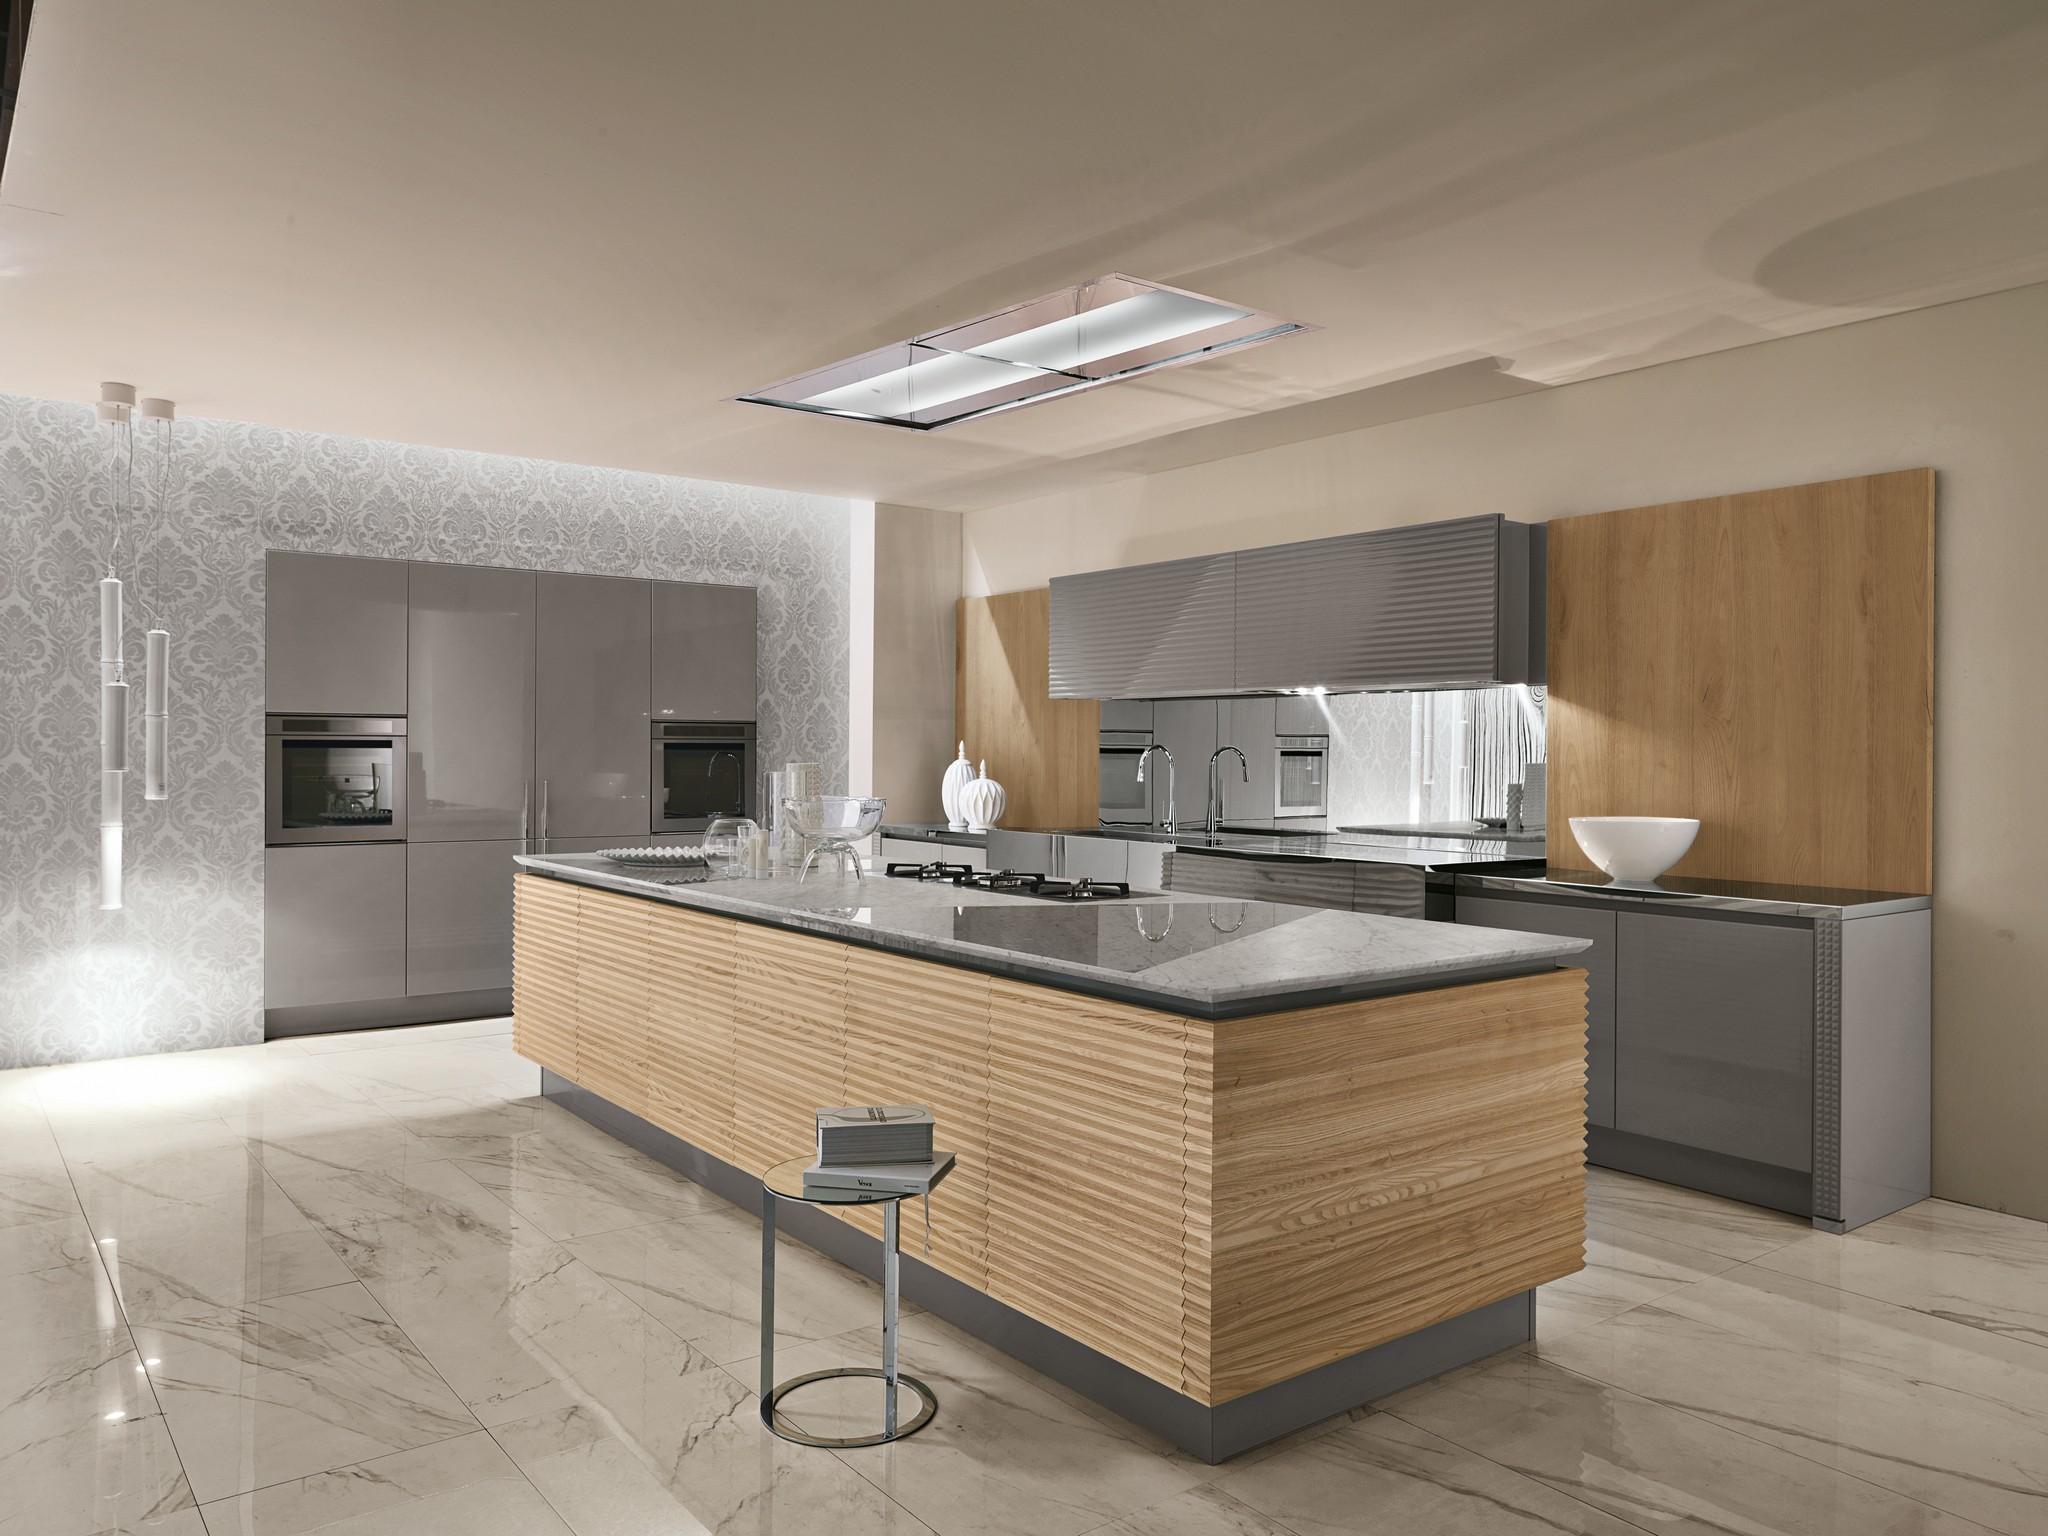 Кухонный гарнитур Aster Cucine Contempora 11